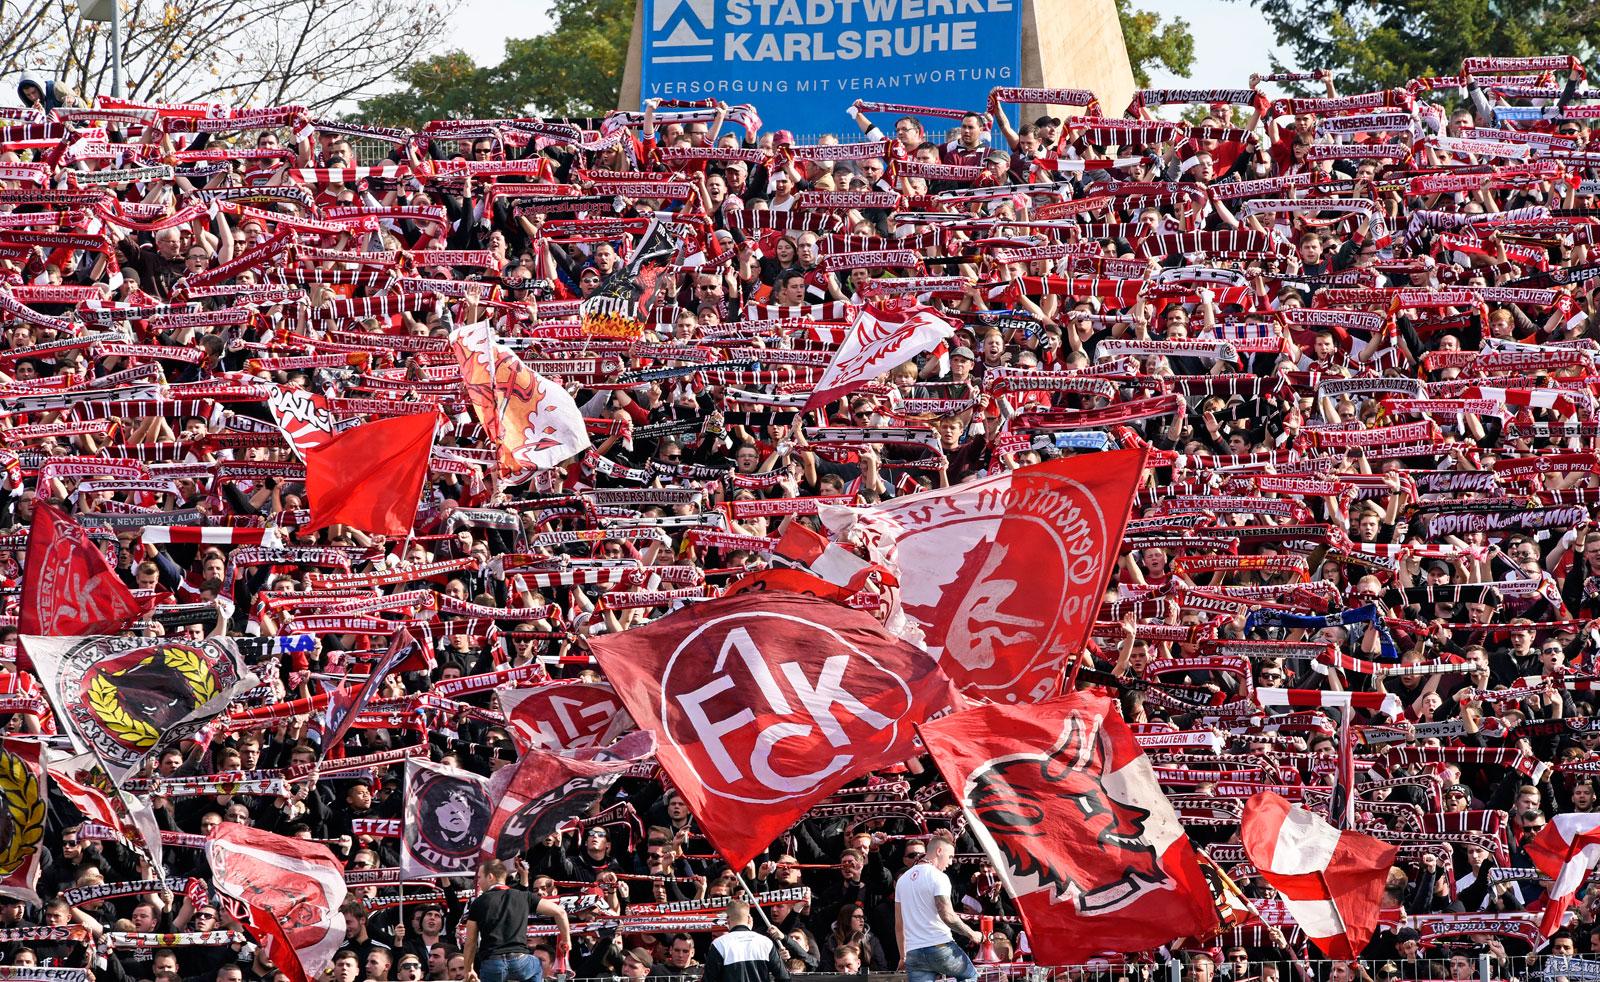 Fck Karlsruhe